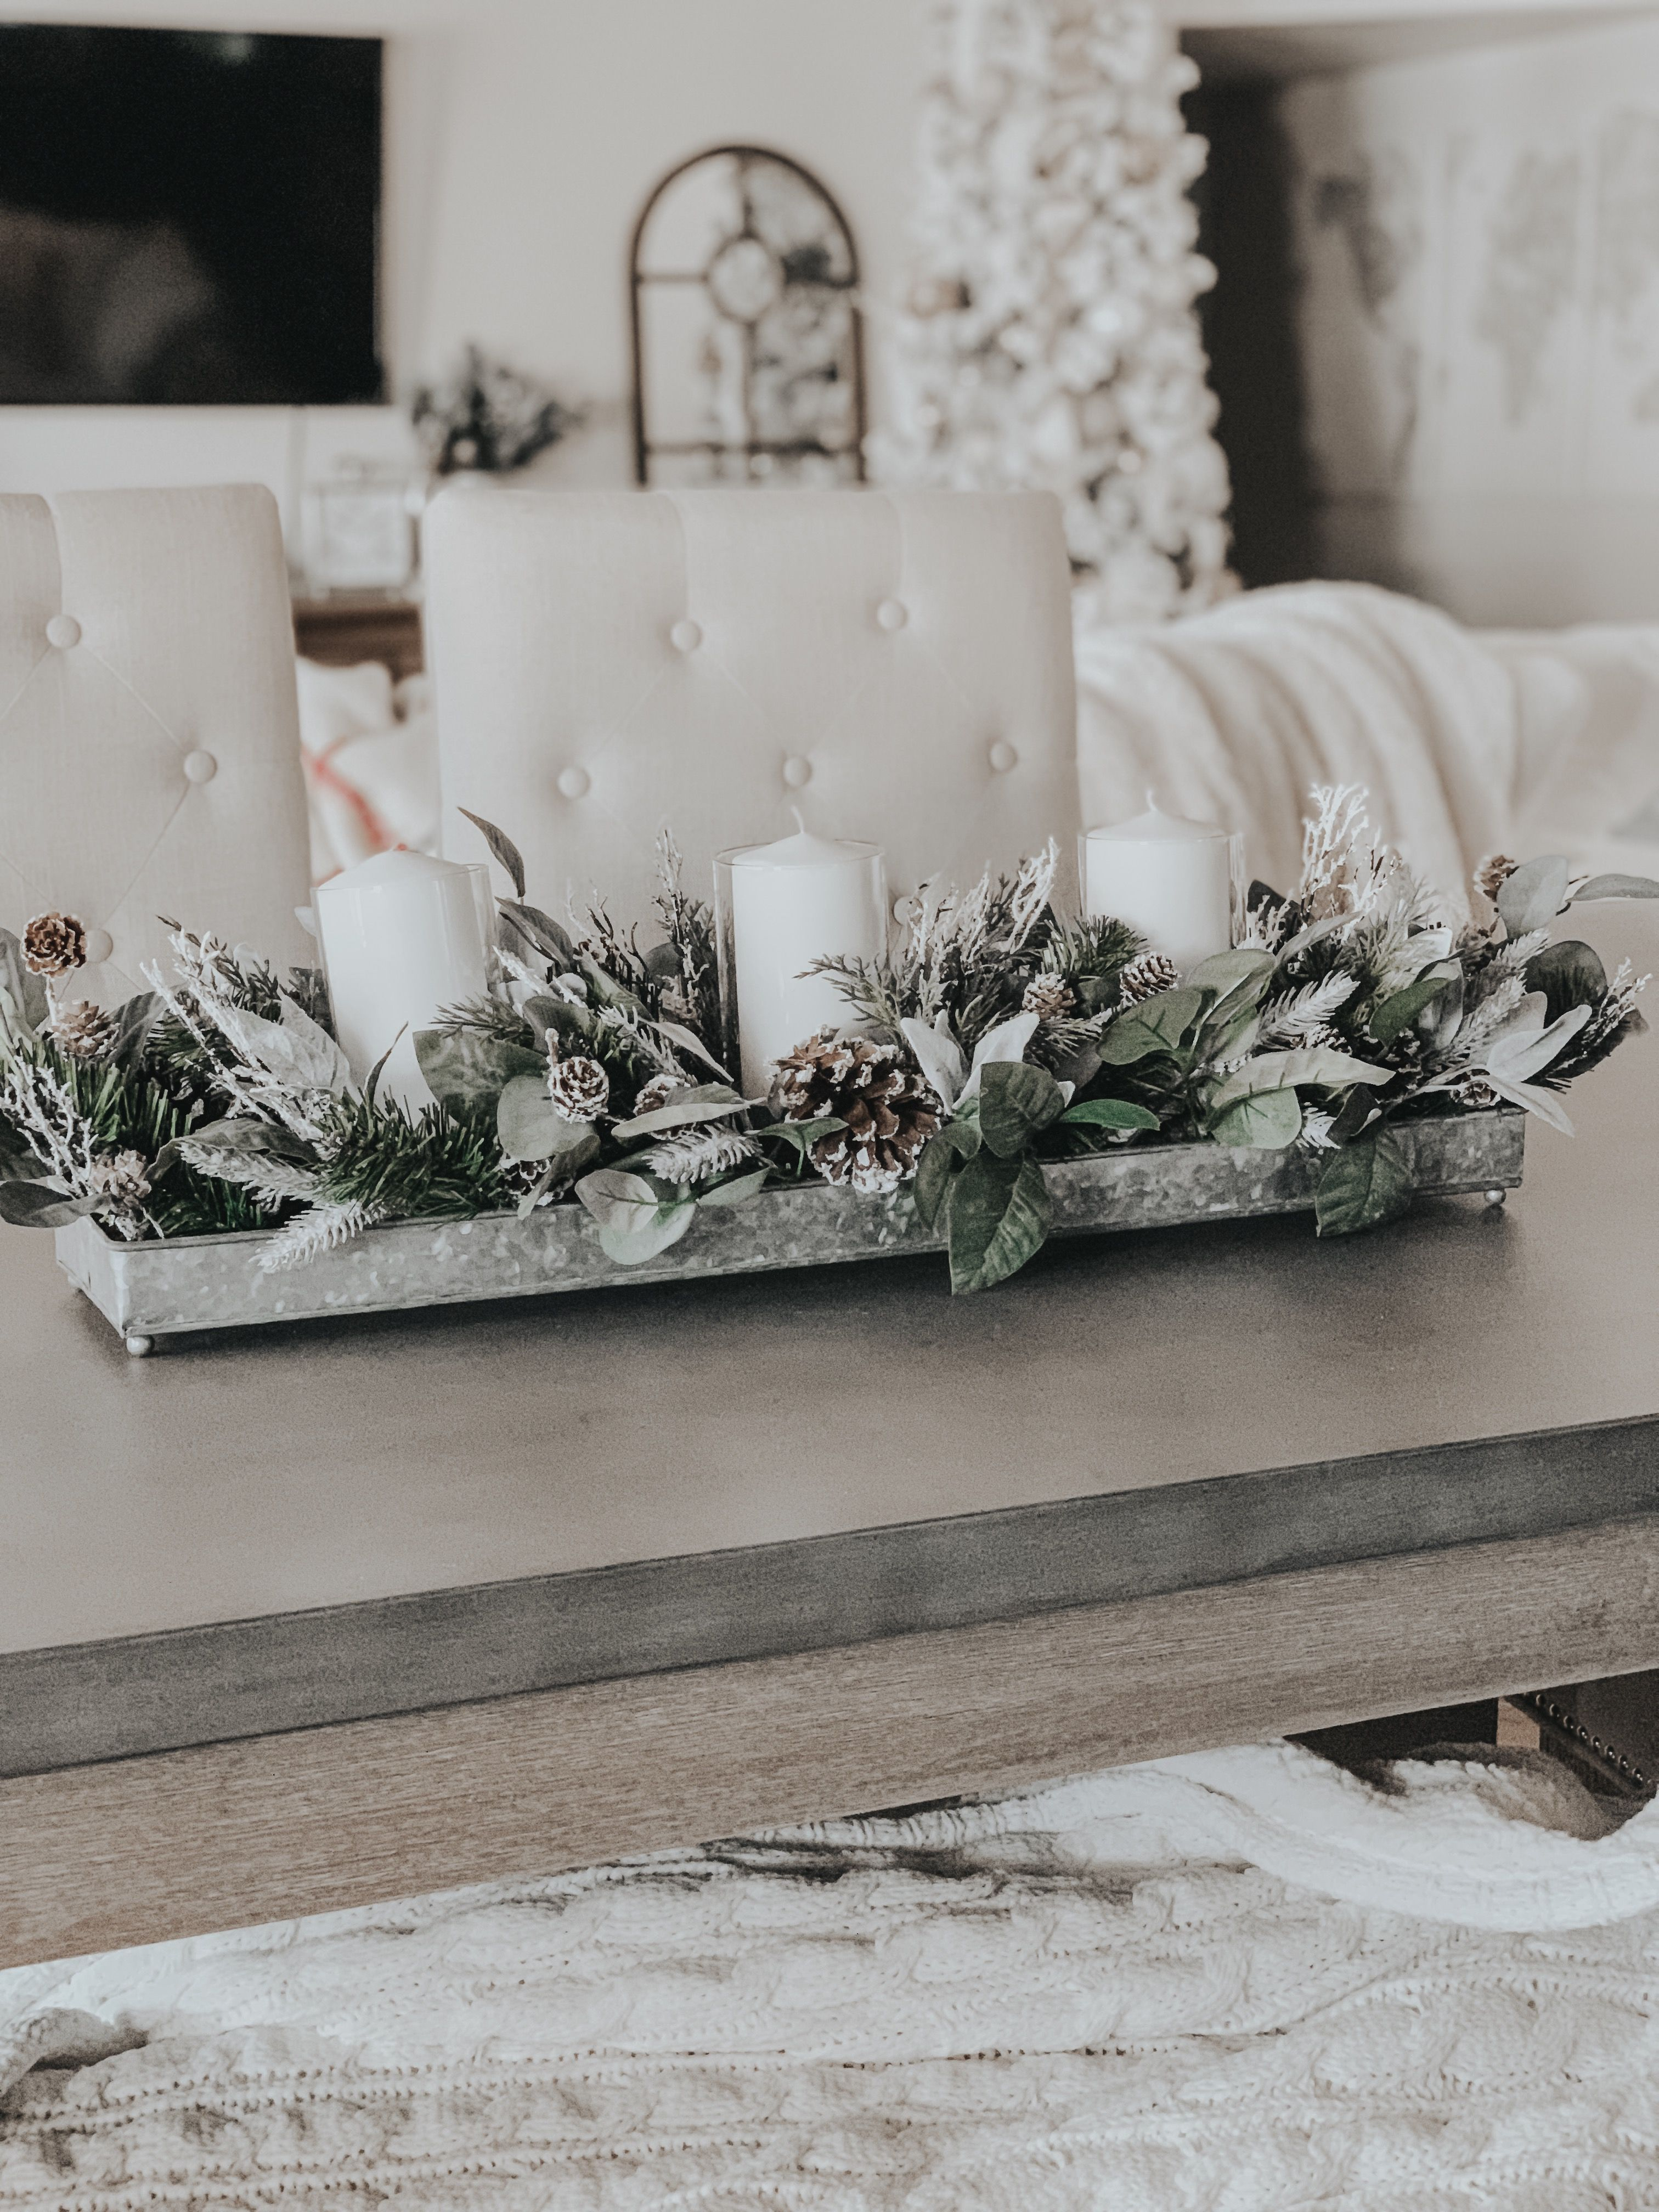 Cute Modern Rustic Christmas Table Centerpiece Christmas Table Centerpieces Christmas Decorations Christmas Table